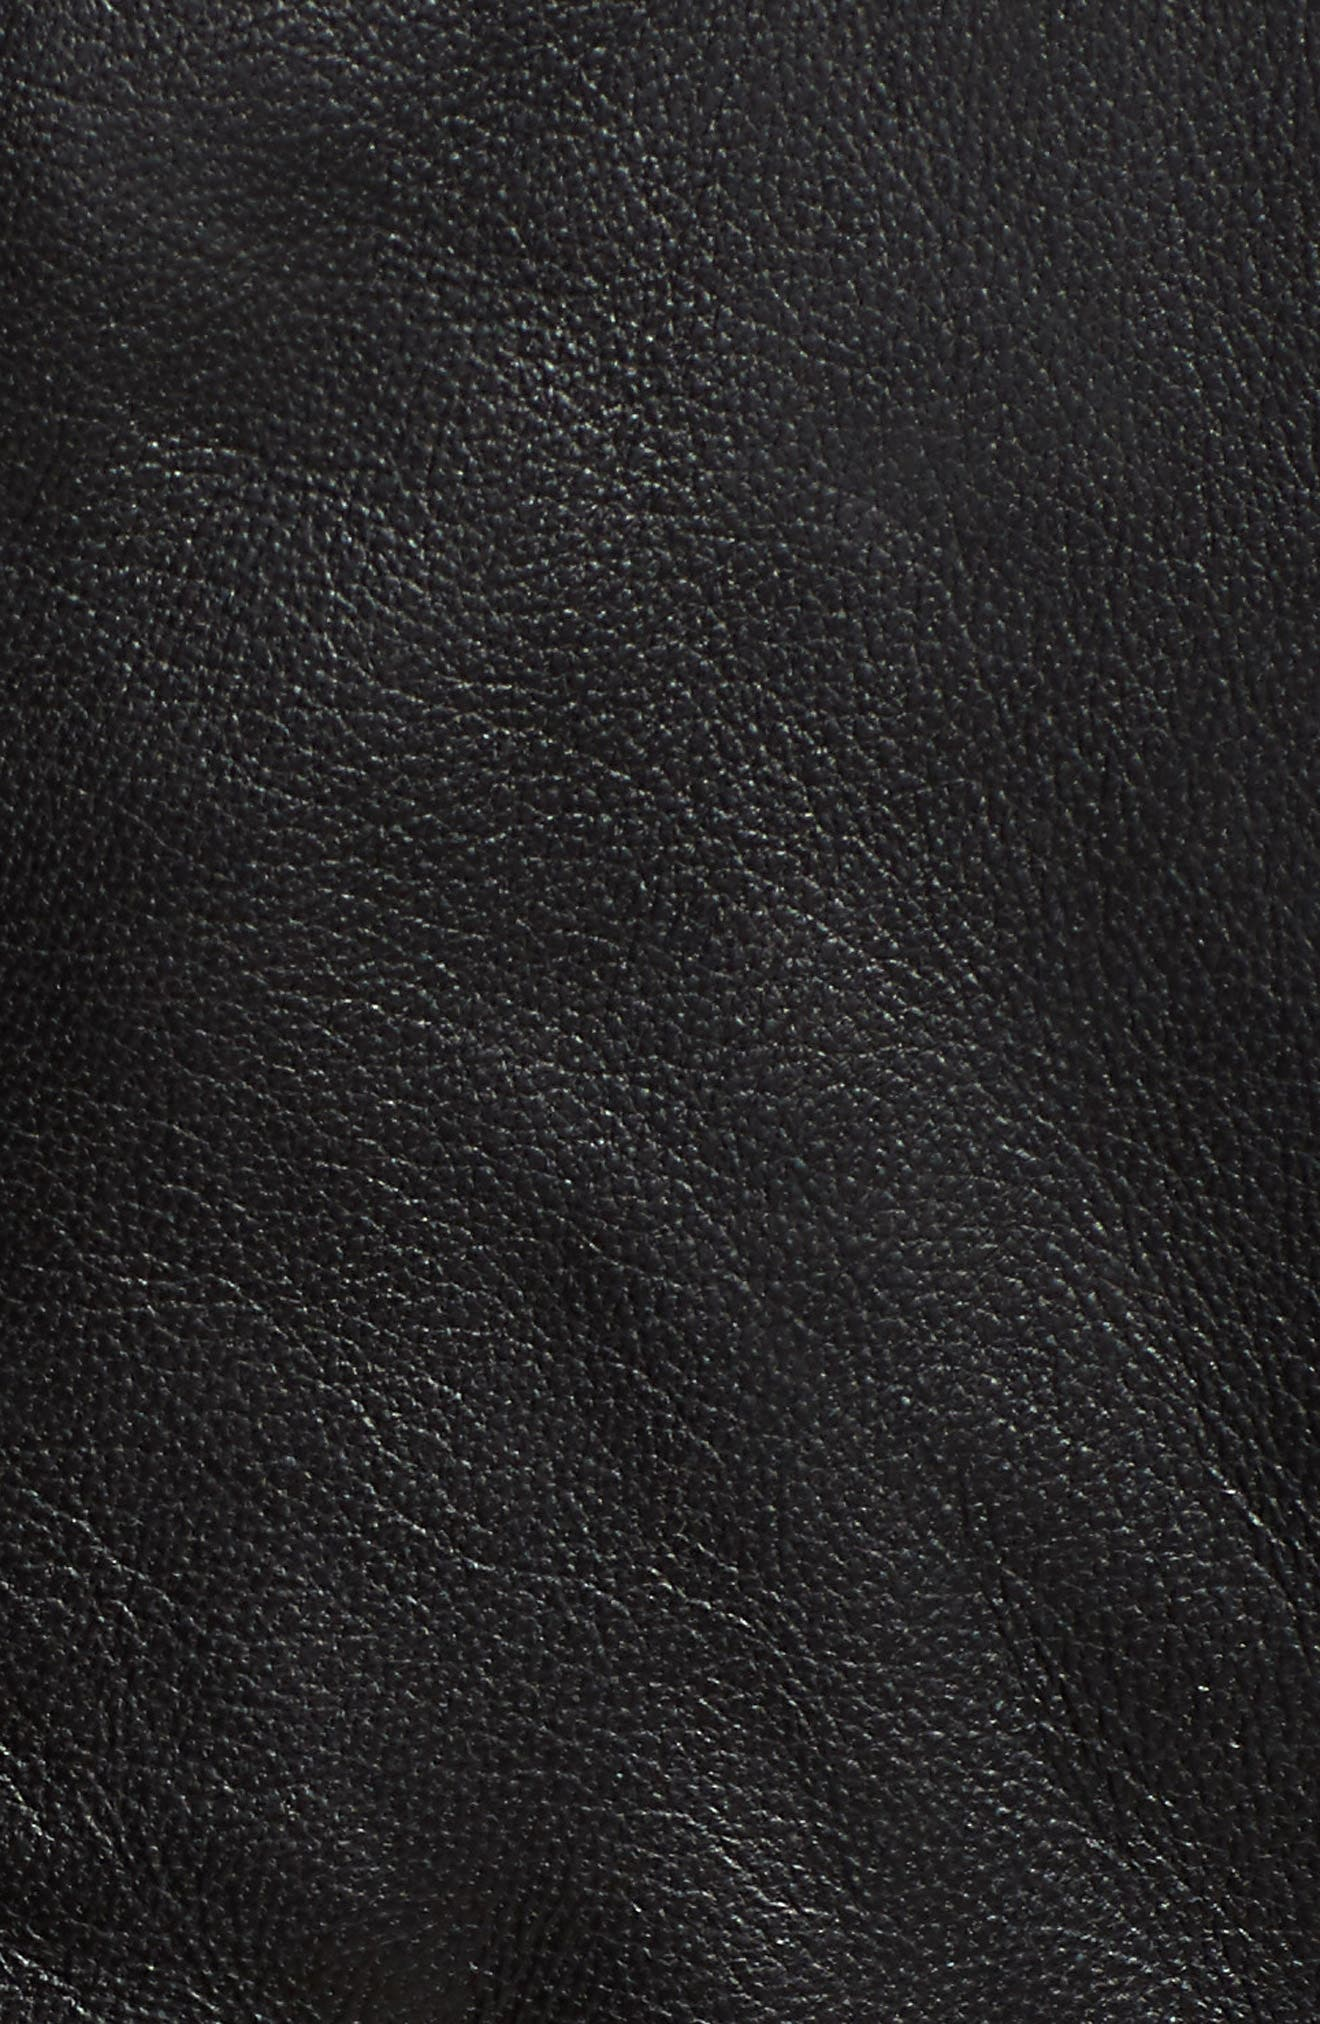 Zip Racer Leather Jacket,                             Alternate thumbnail 7, color,                             BLACK